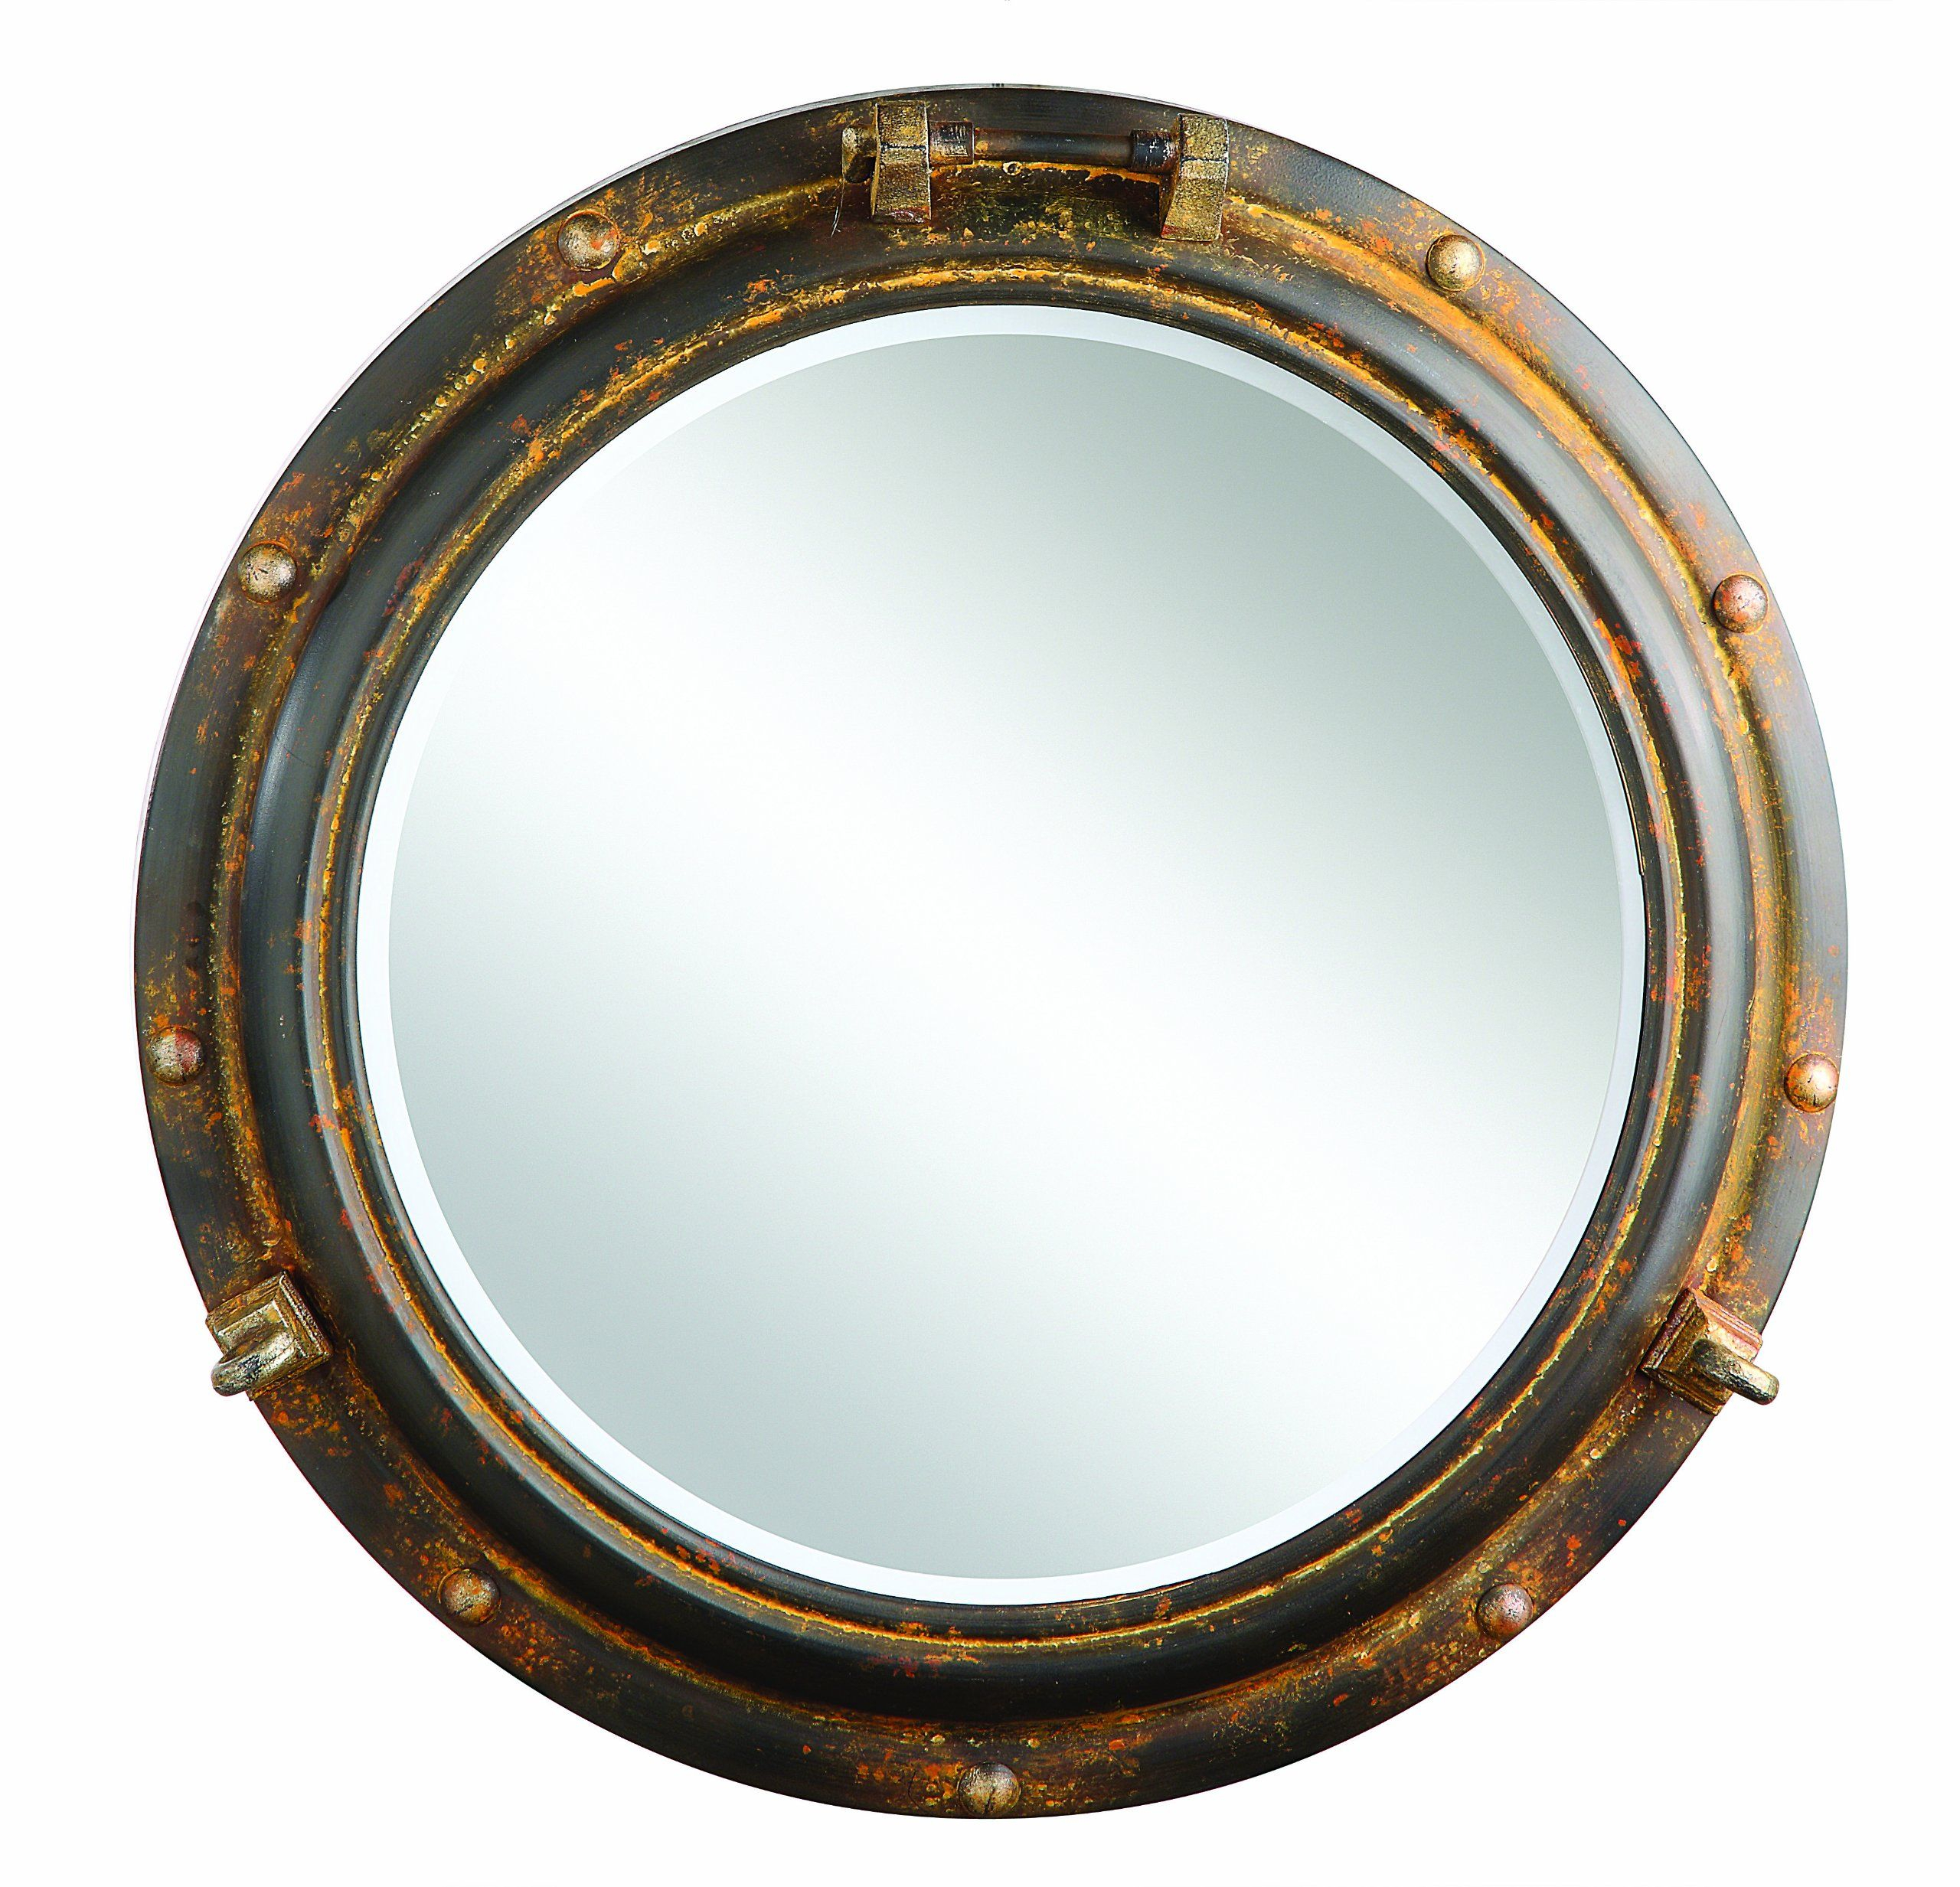 Creative Co Op Porthole Mirror, Rust Metal (Image 11 of 20)